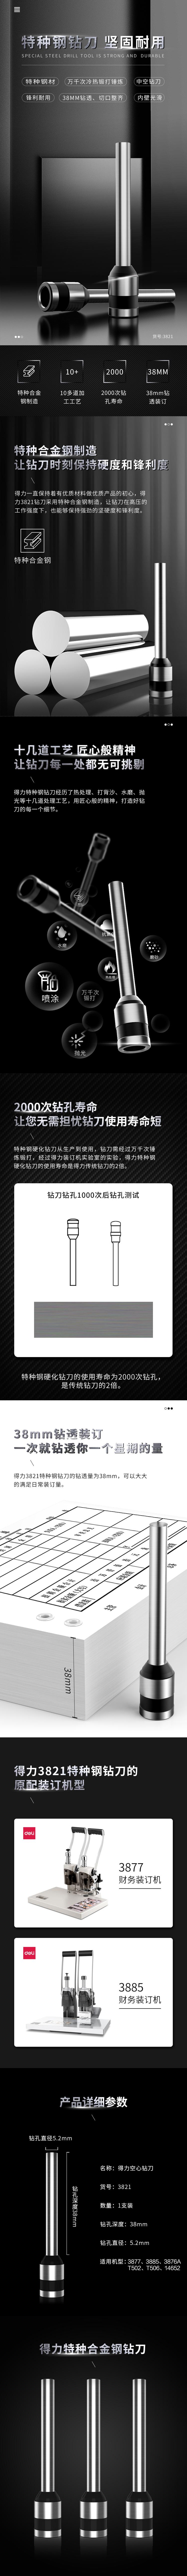 VWIN真人3821空心钻刀(银色)(只)